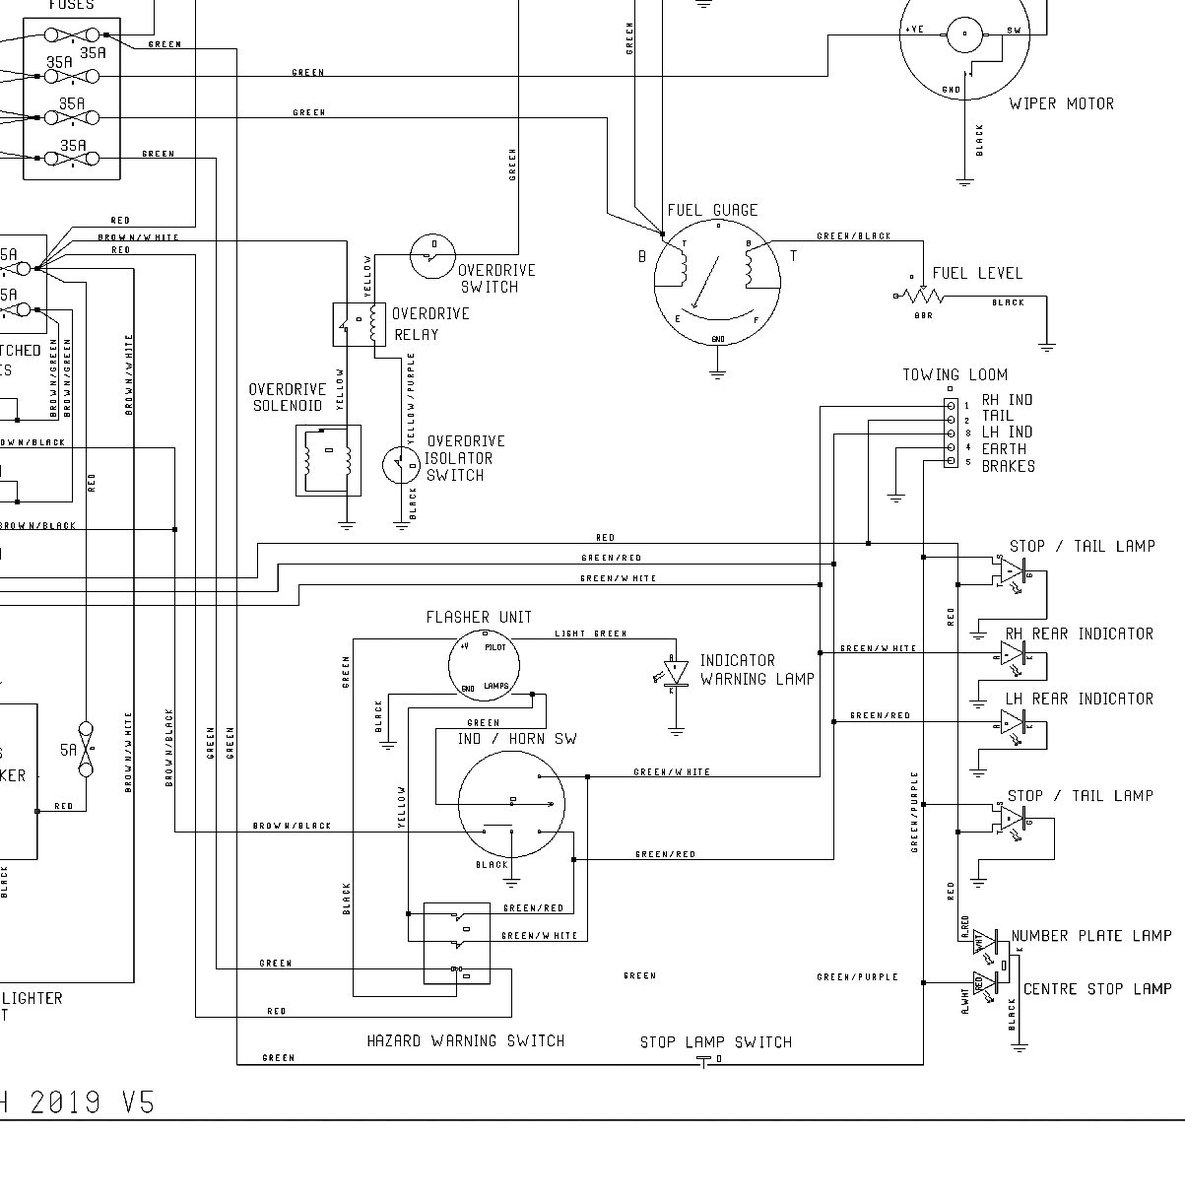 hight resolution of 1397421702 hazardwiring thumb jpg 3e01530241b7d8915744168b79886259 jpg